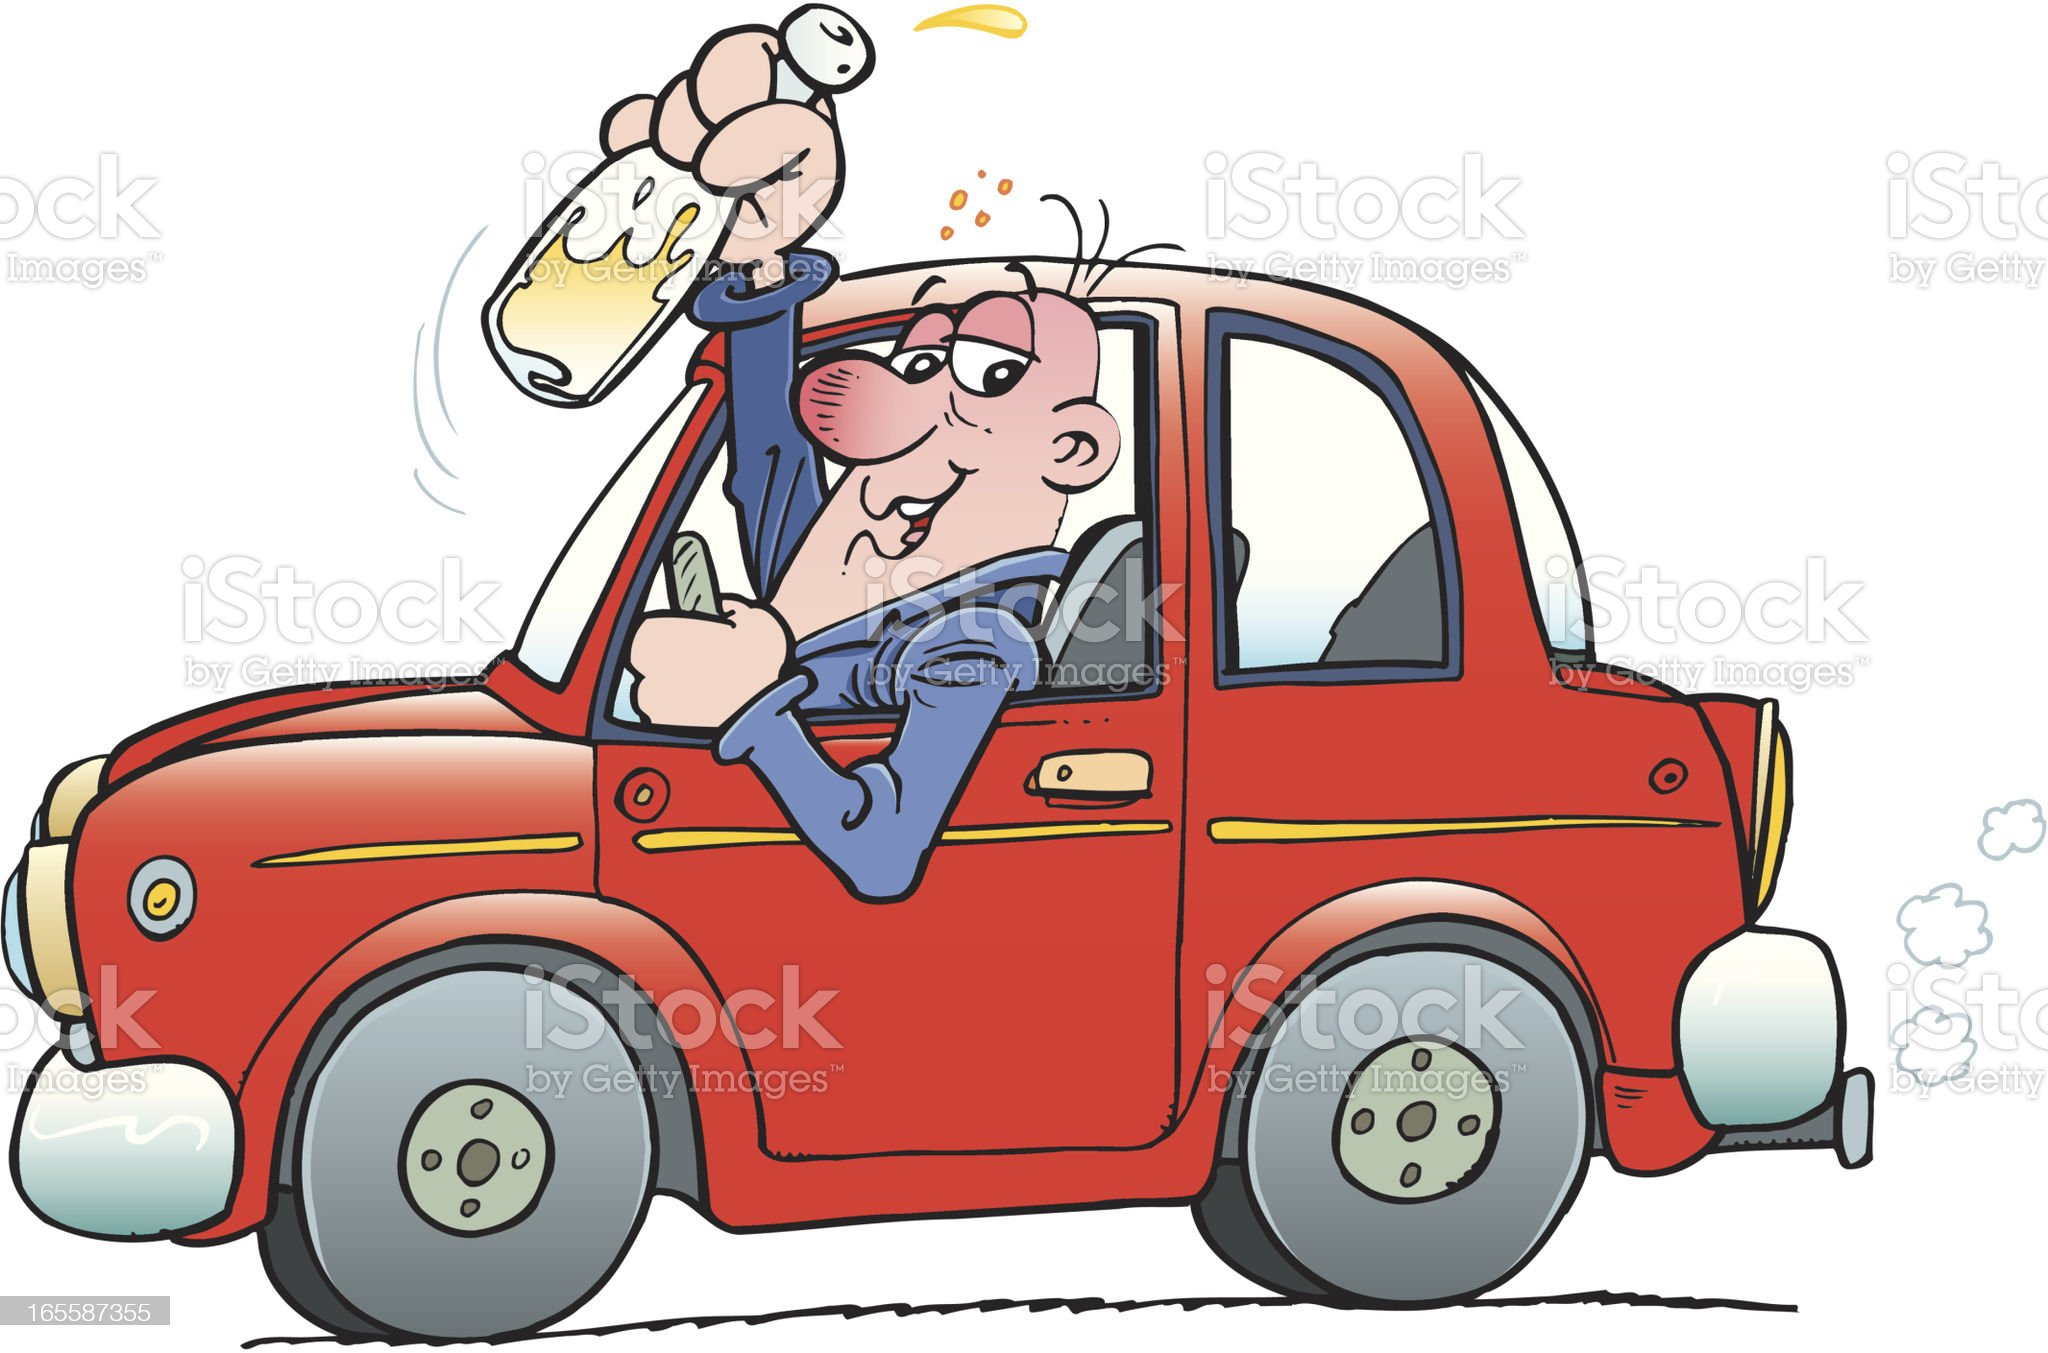 Drunk driver royalty-free stock vector art